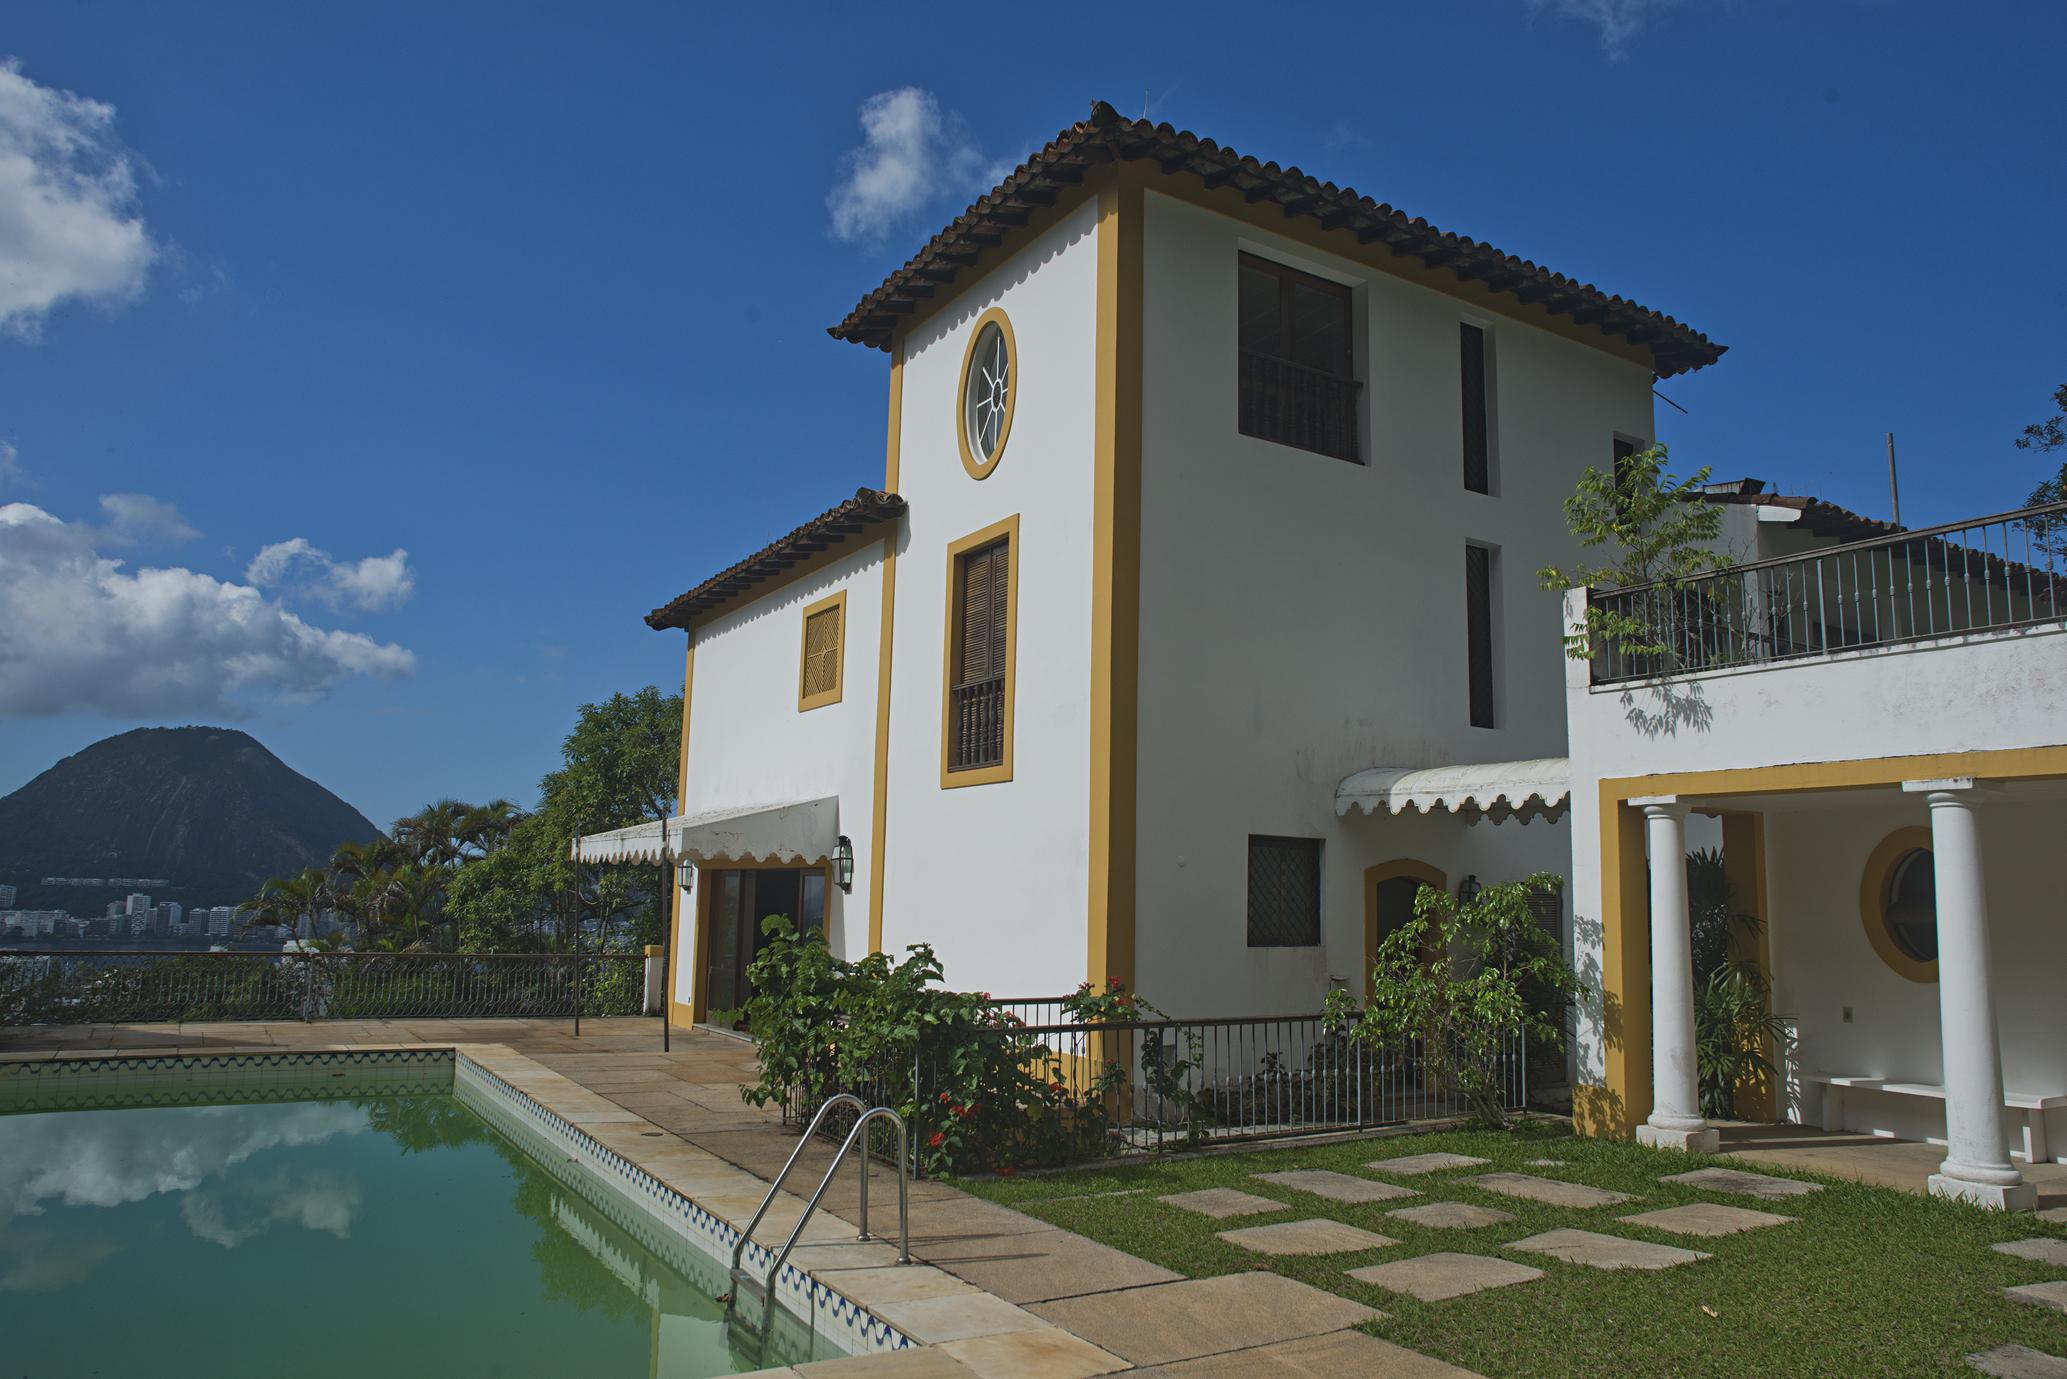 Maison unifamiliale pour l Vente à Amazing Historic Property Rua Sara Vilela Rio De Janeiro, Rio De Janeiro, 22460180 Brésil